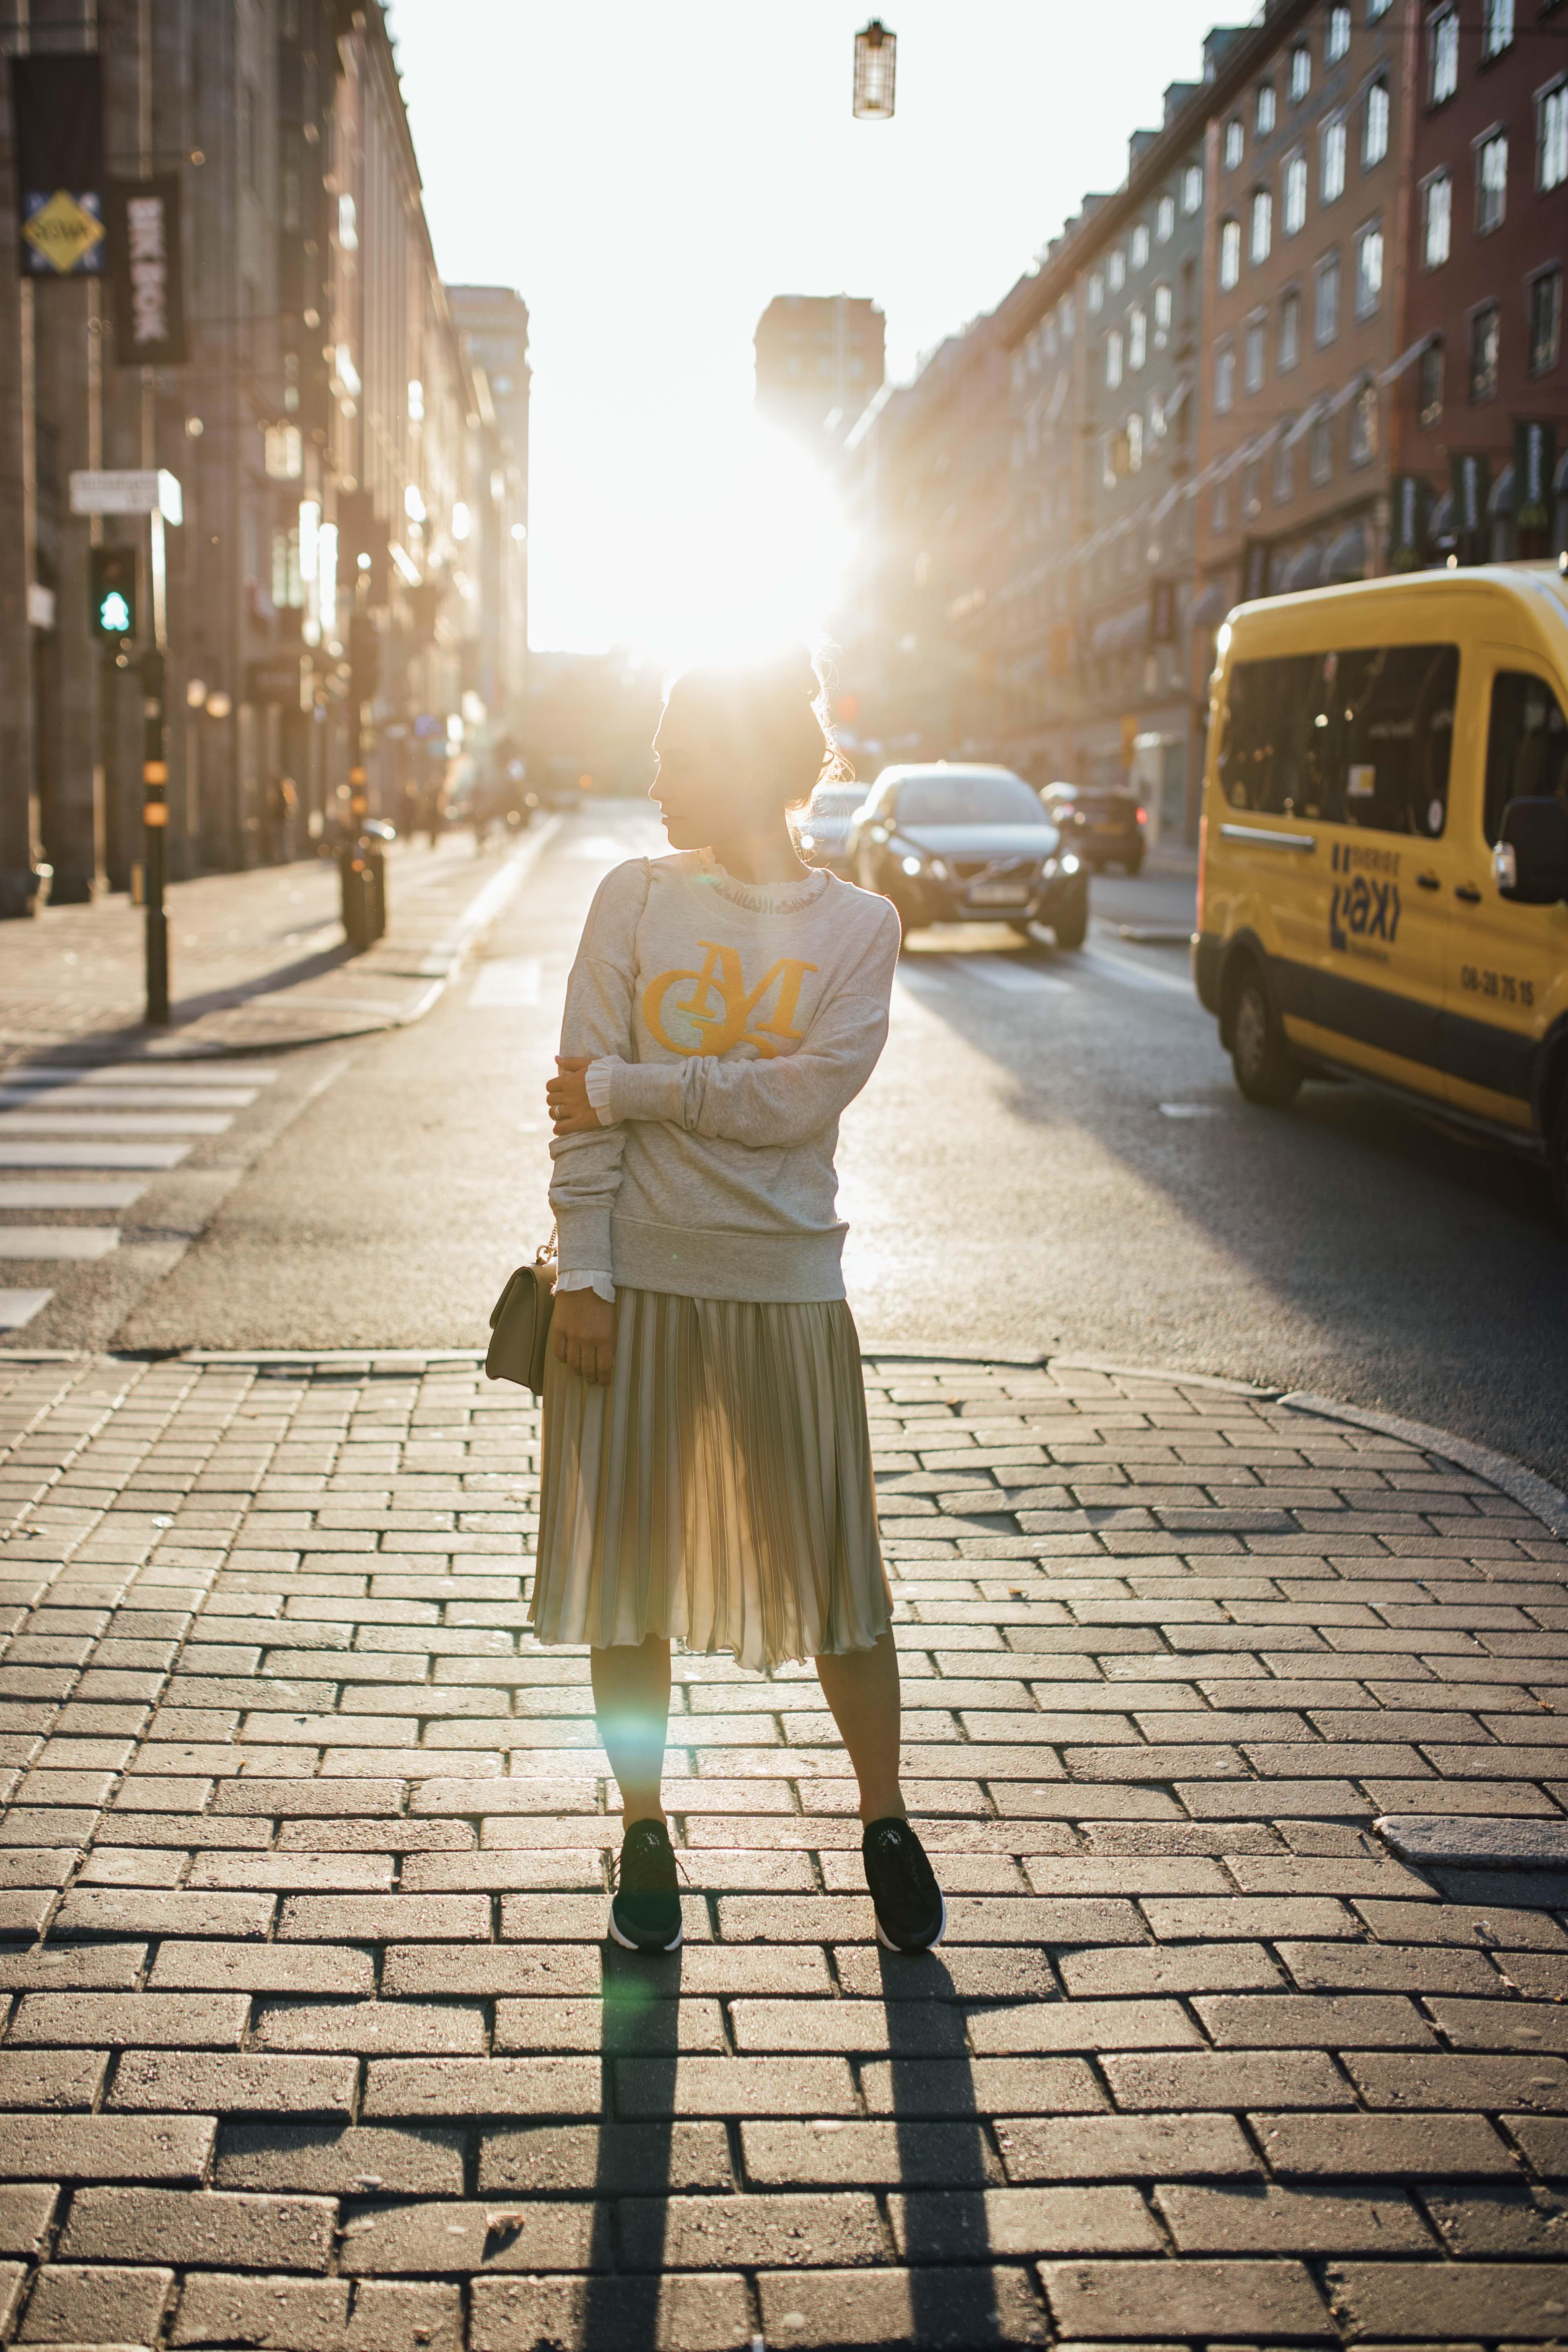 160926_yrml_mop_sweater_web-8